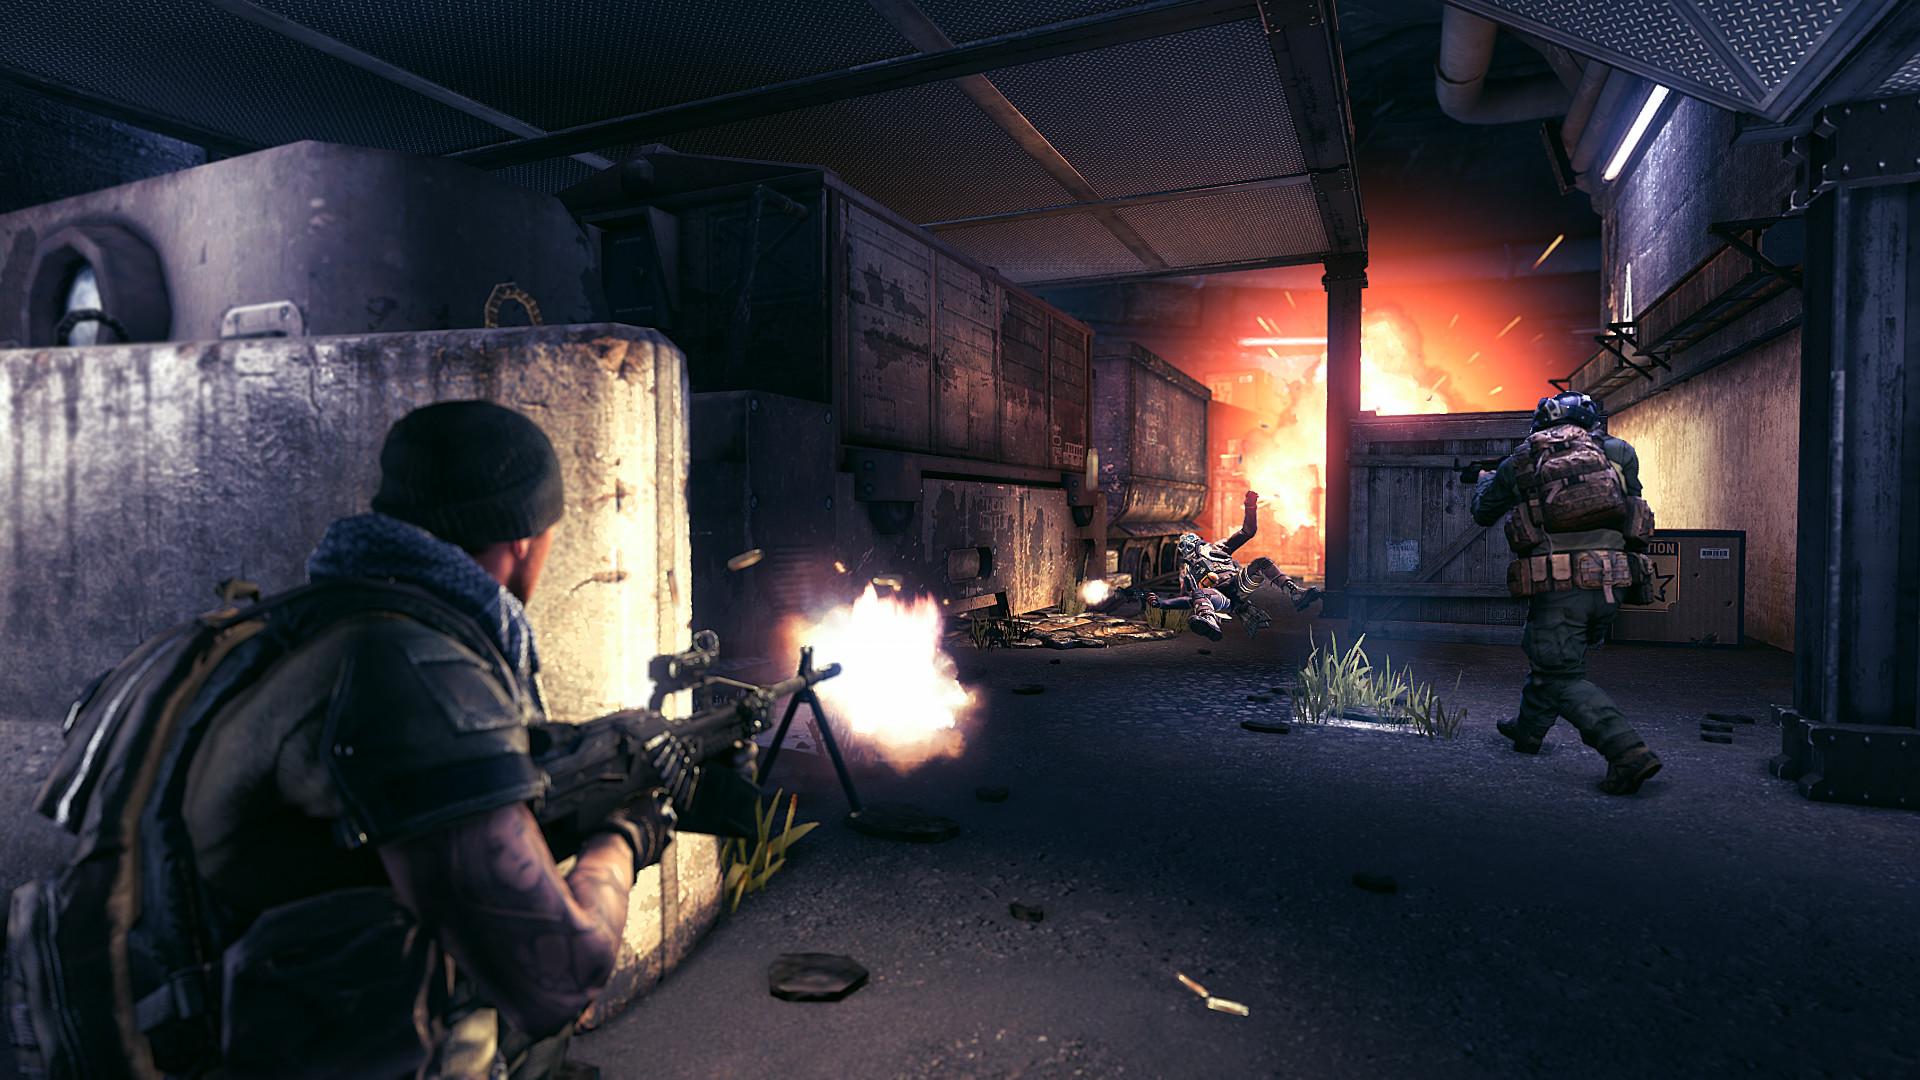 download black squad ocean of games